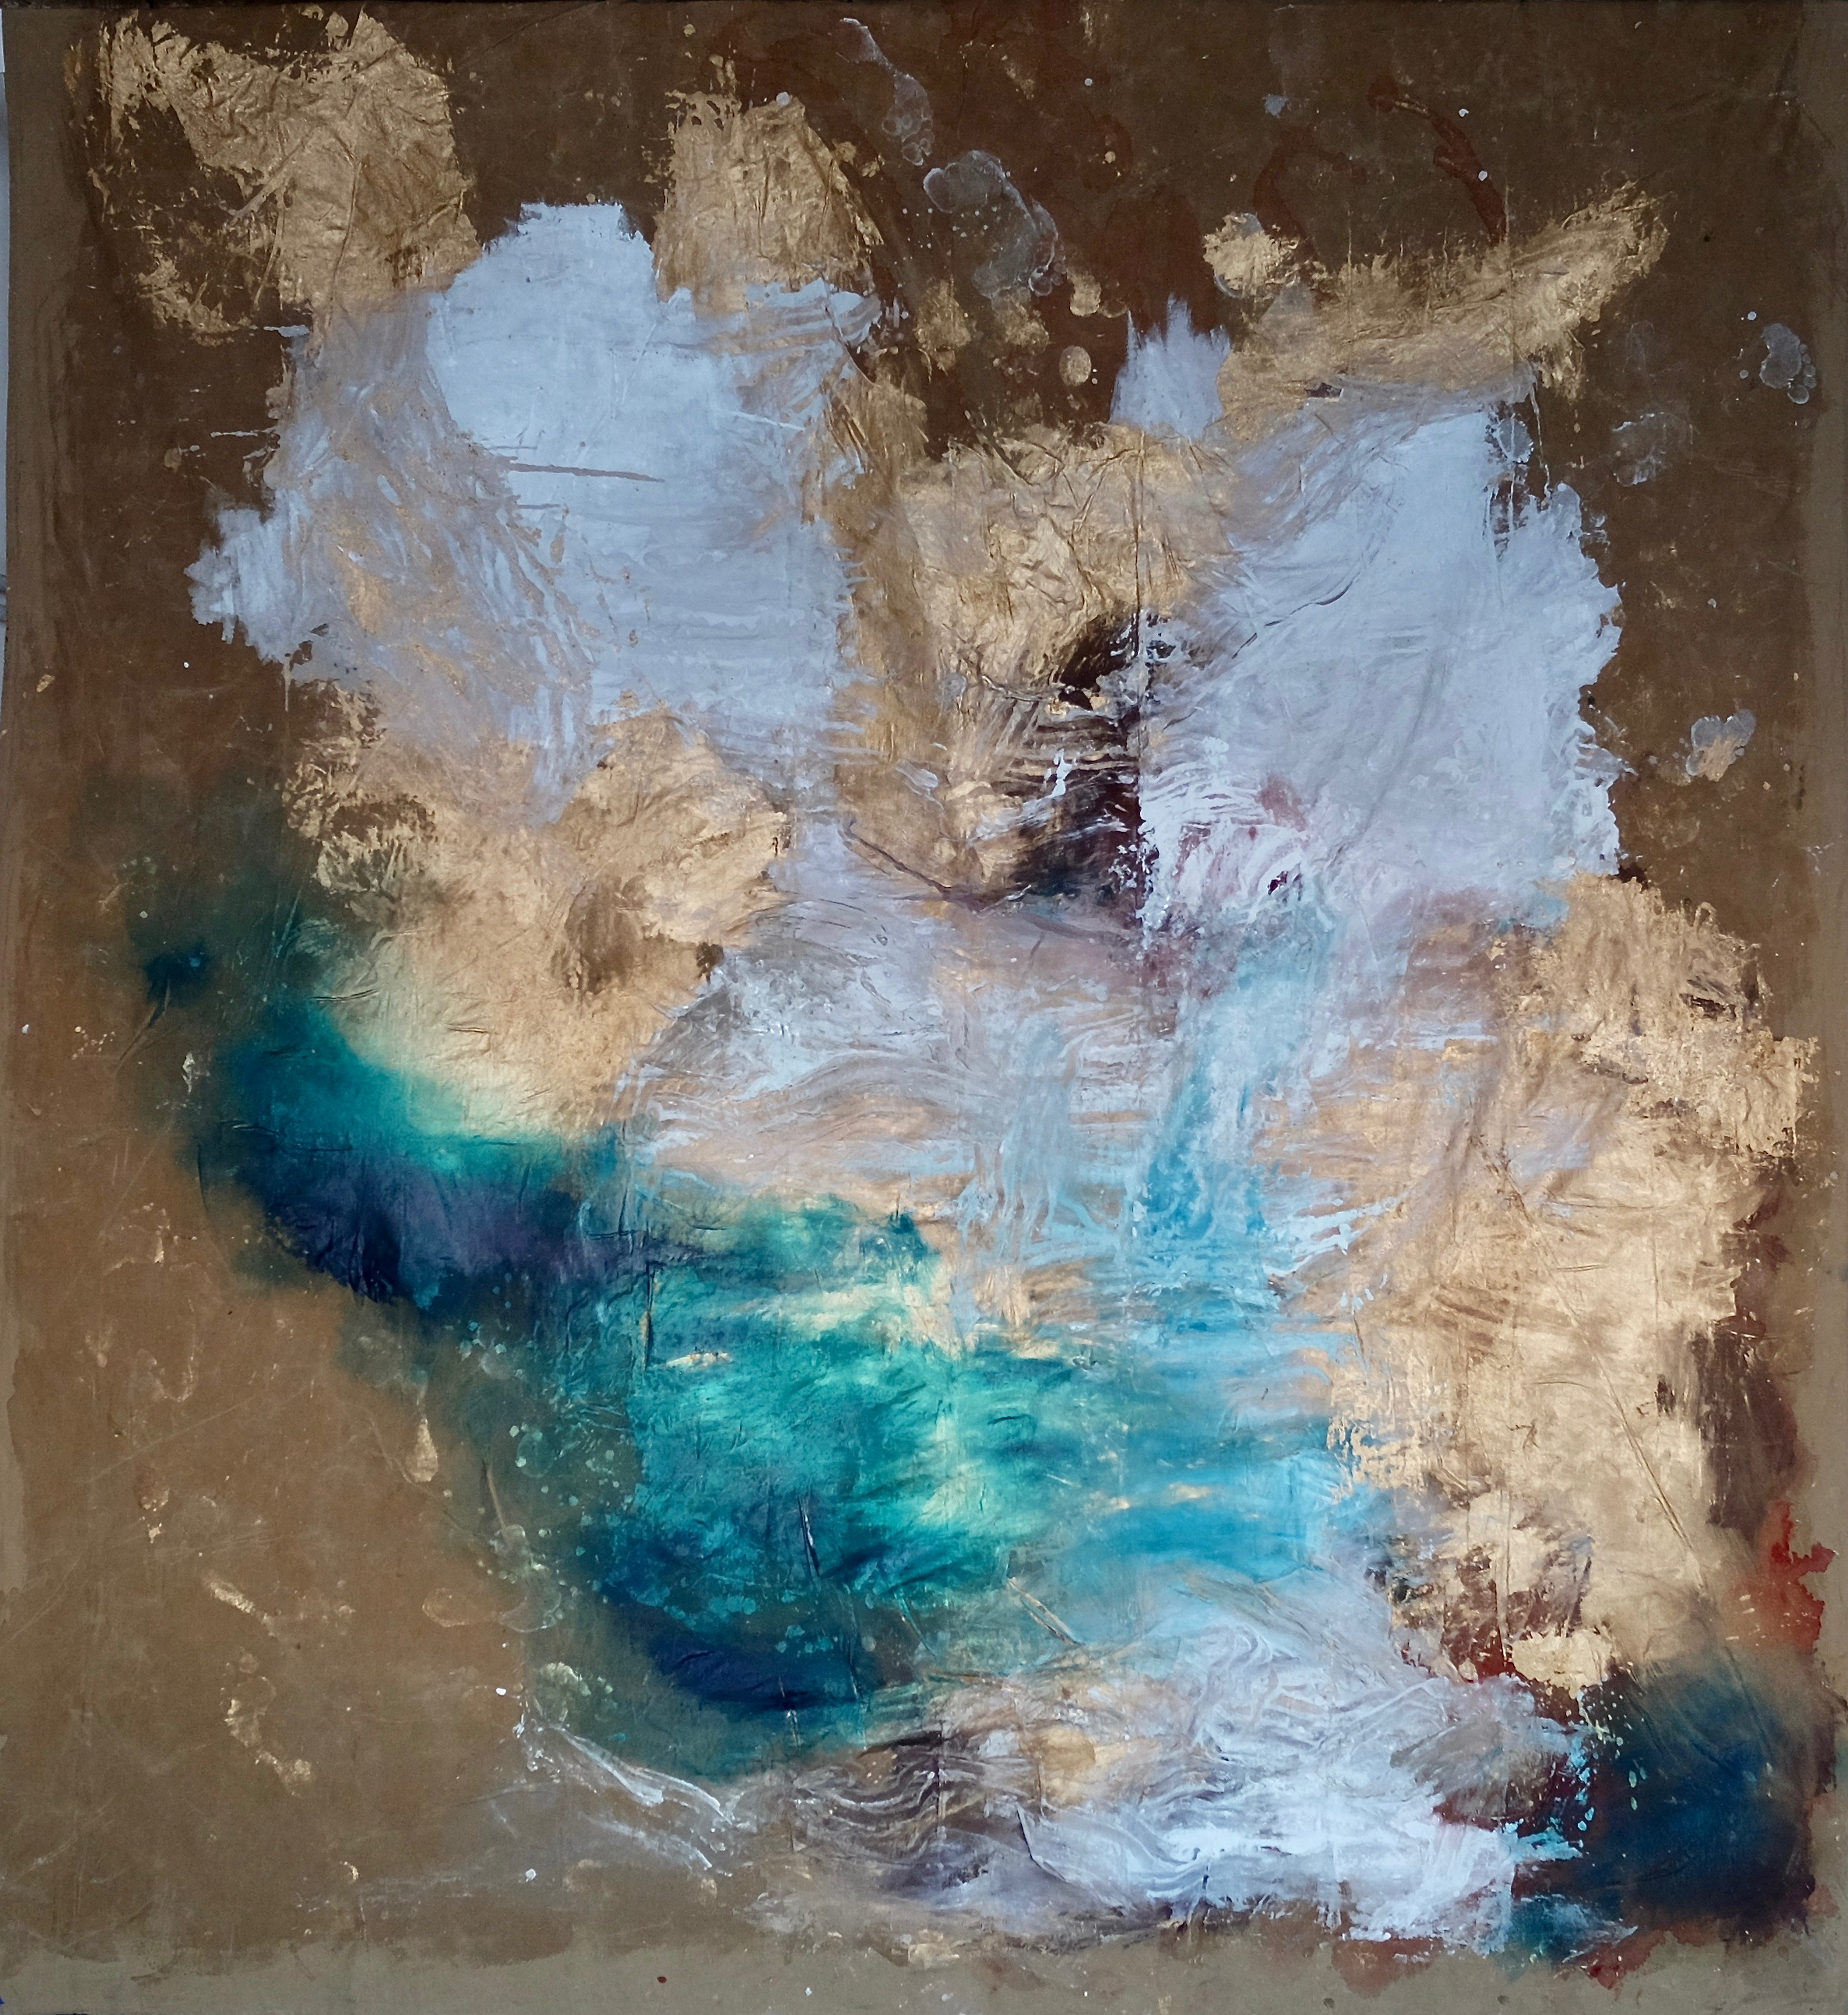 Février 2019, 310x270 cm, mixed medias on free linen canvas.